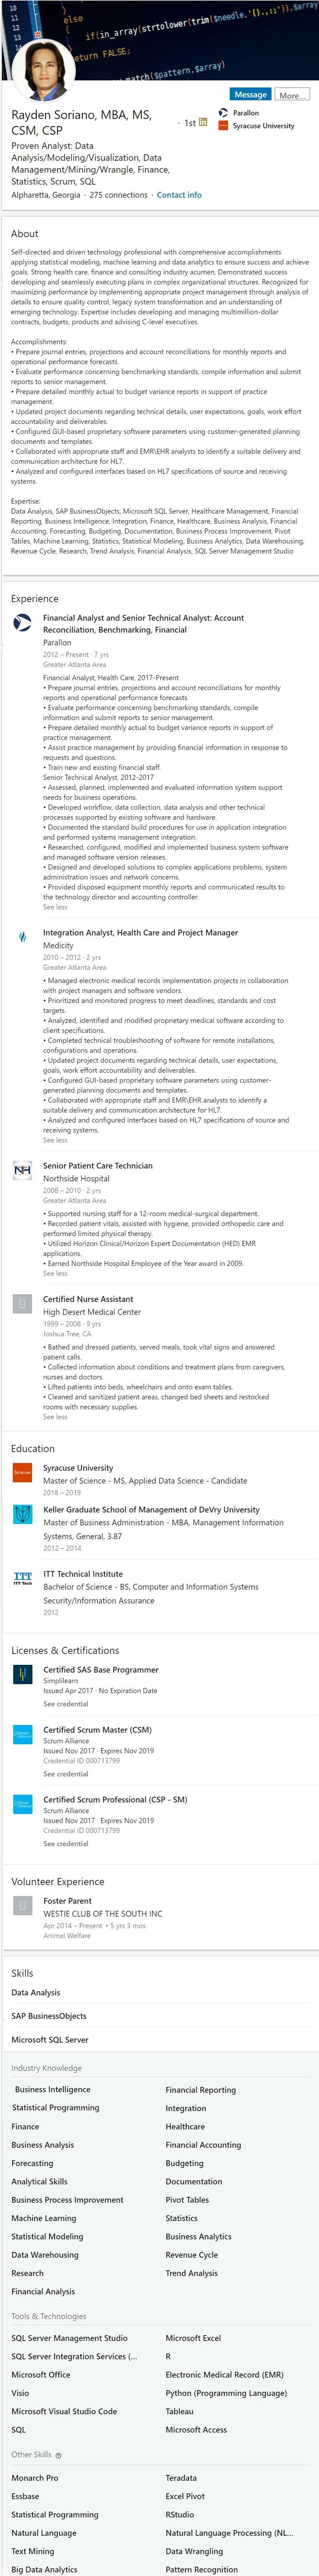 Business Intelligence Data Mining Analyst Linkedin Profile Example  2505